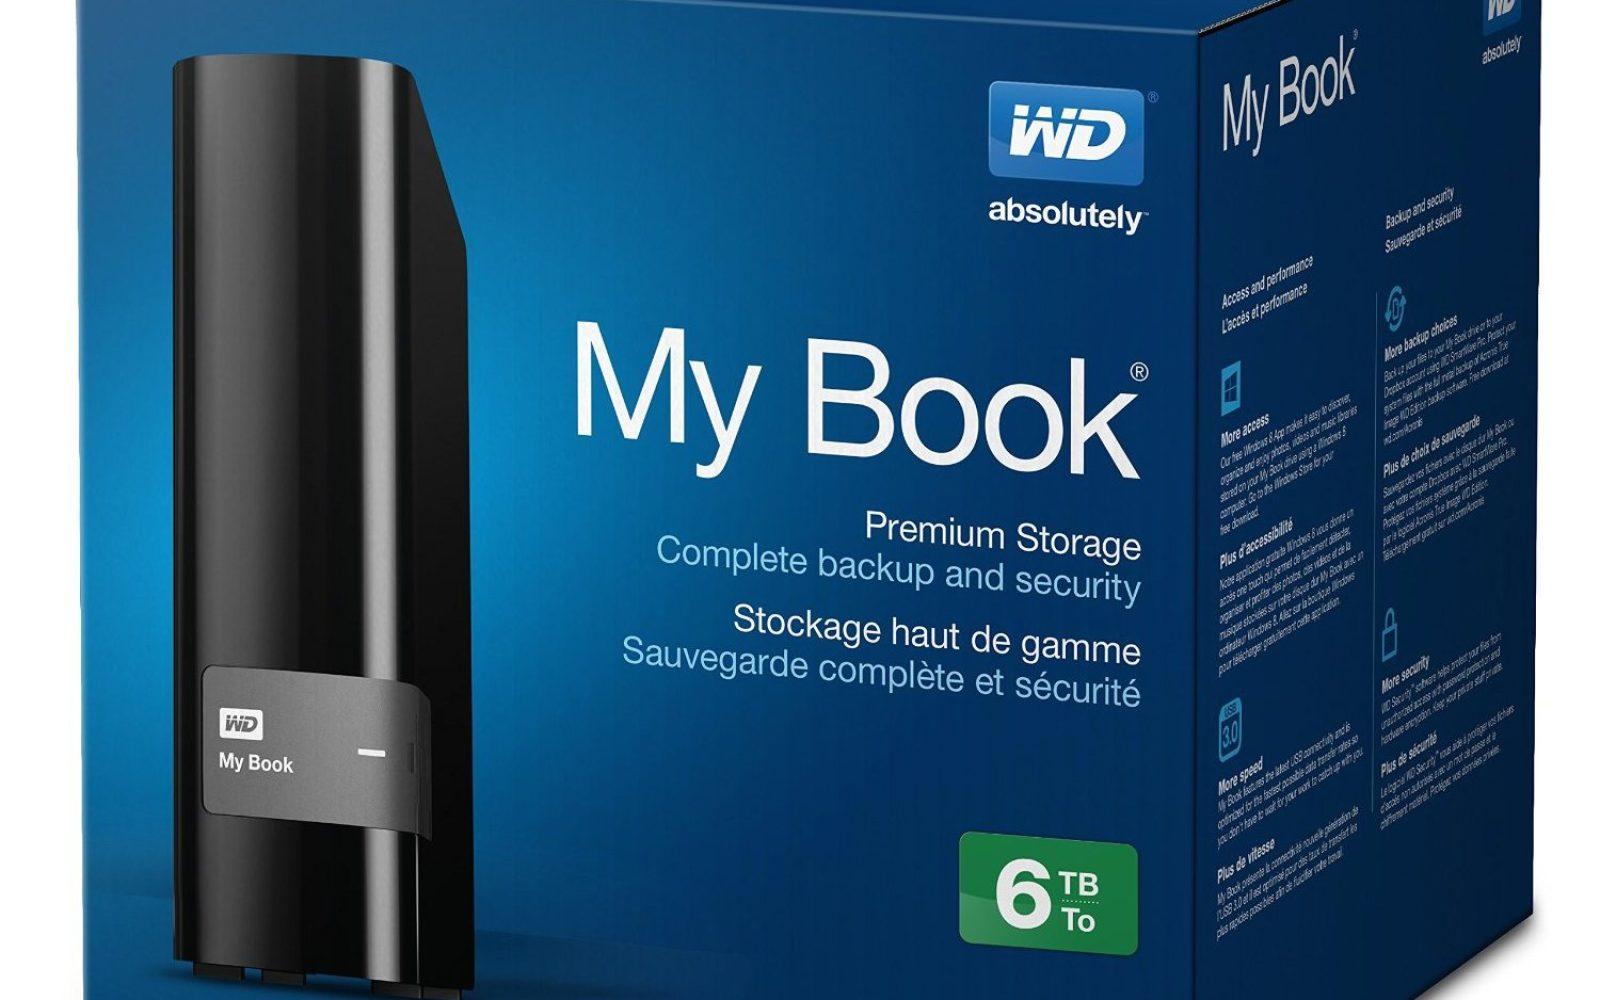 WD My Book 6TB USB 3 0 Desktop External Hard Drive $200